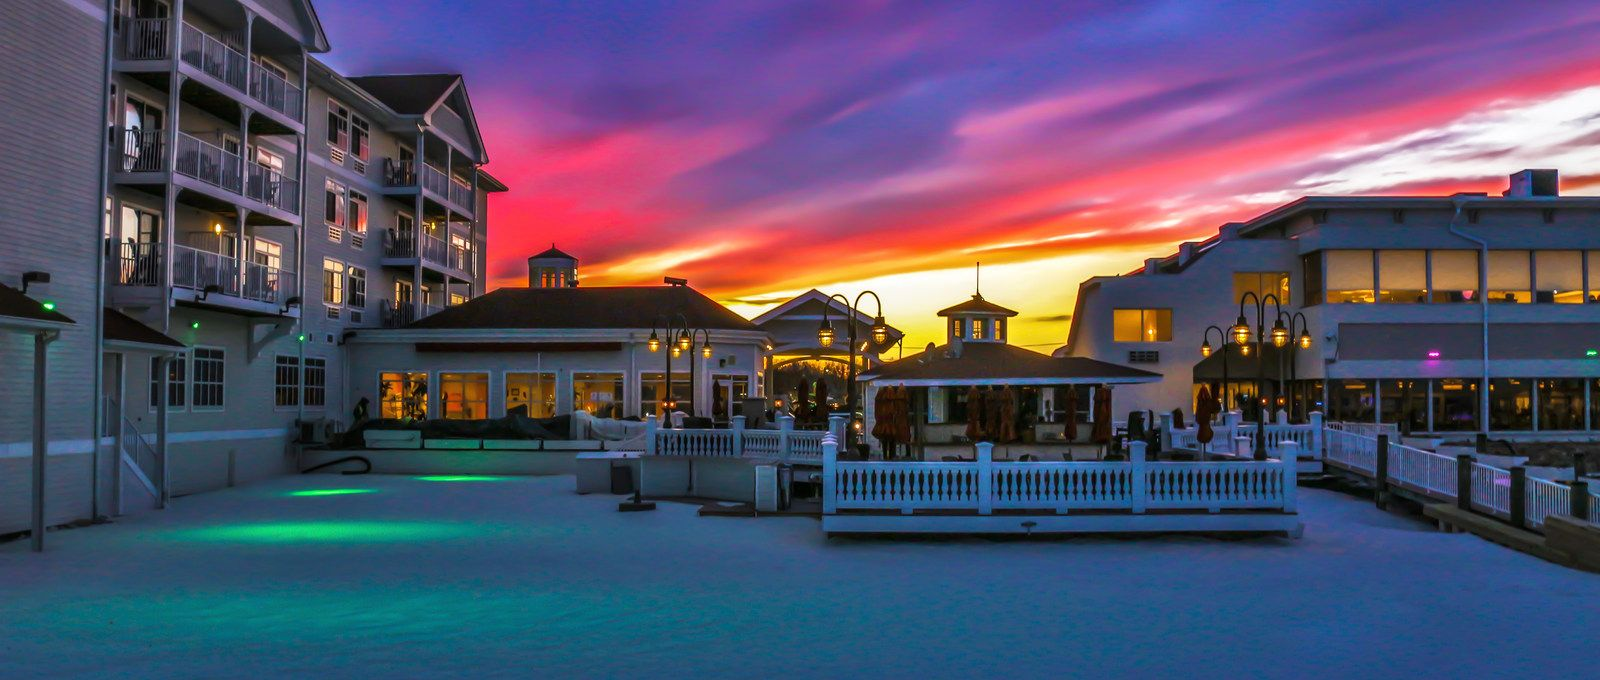 Chesapeake Bay Hotels Beach Resort Spa Stay Overnight Spring Summer